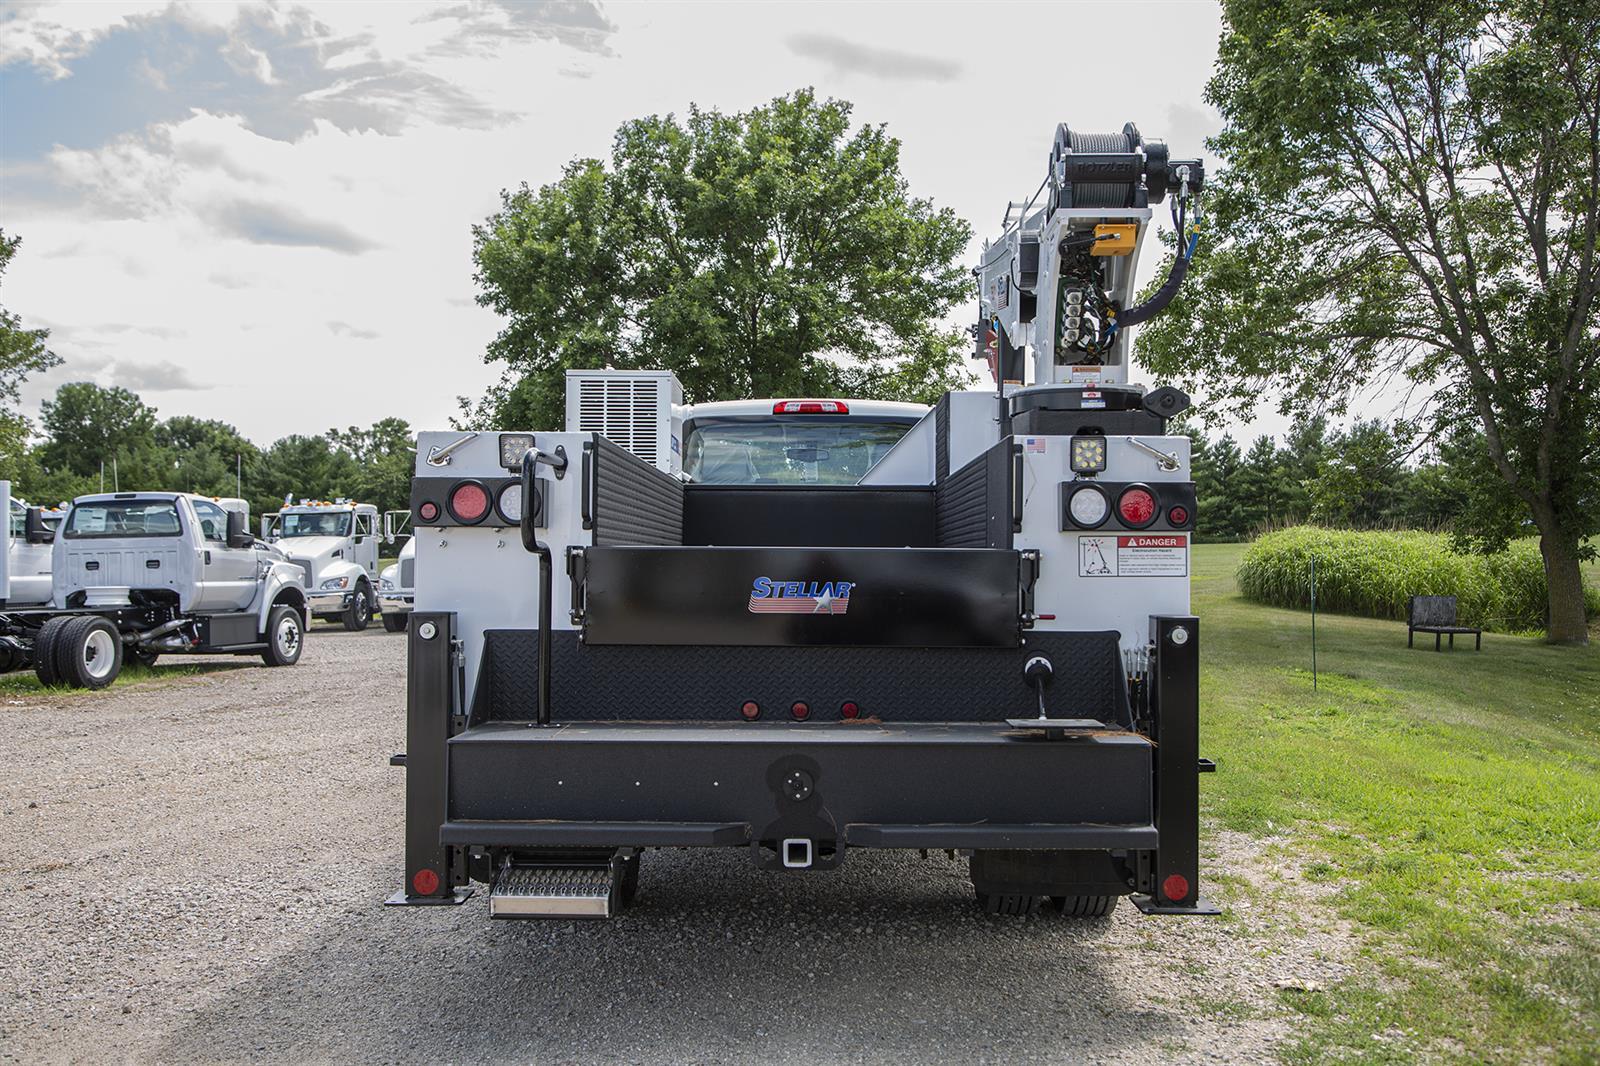 2019 Chevrolet Silverado 5500, TMAX™ 1-11 #132065 - photo 1